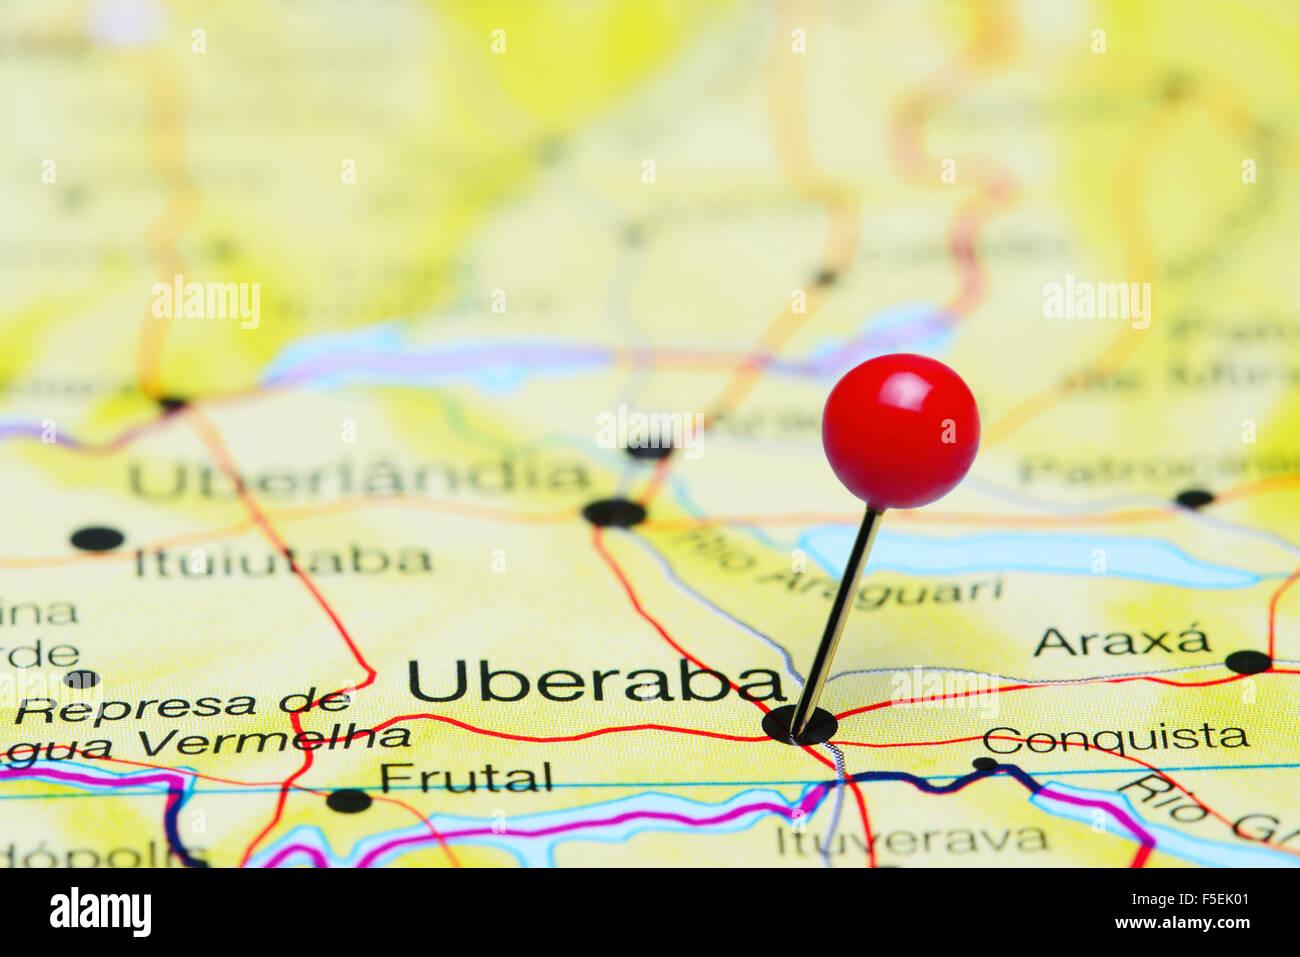 Uberaba pinned on a map of Brazil Stock Photo